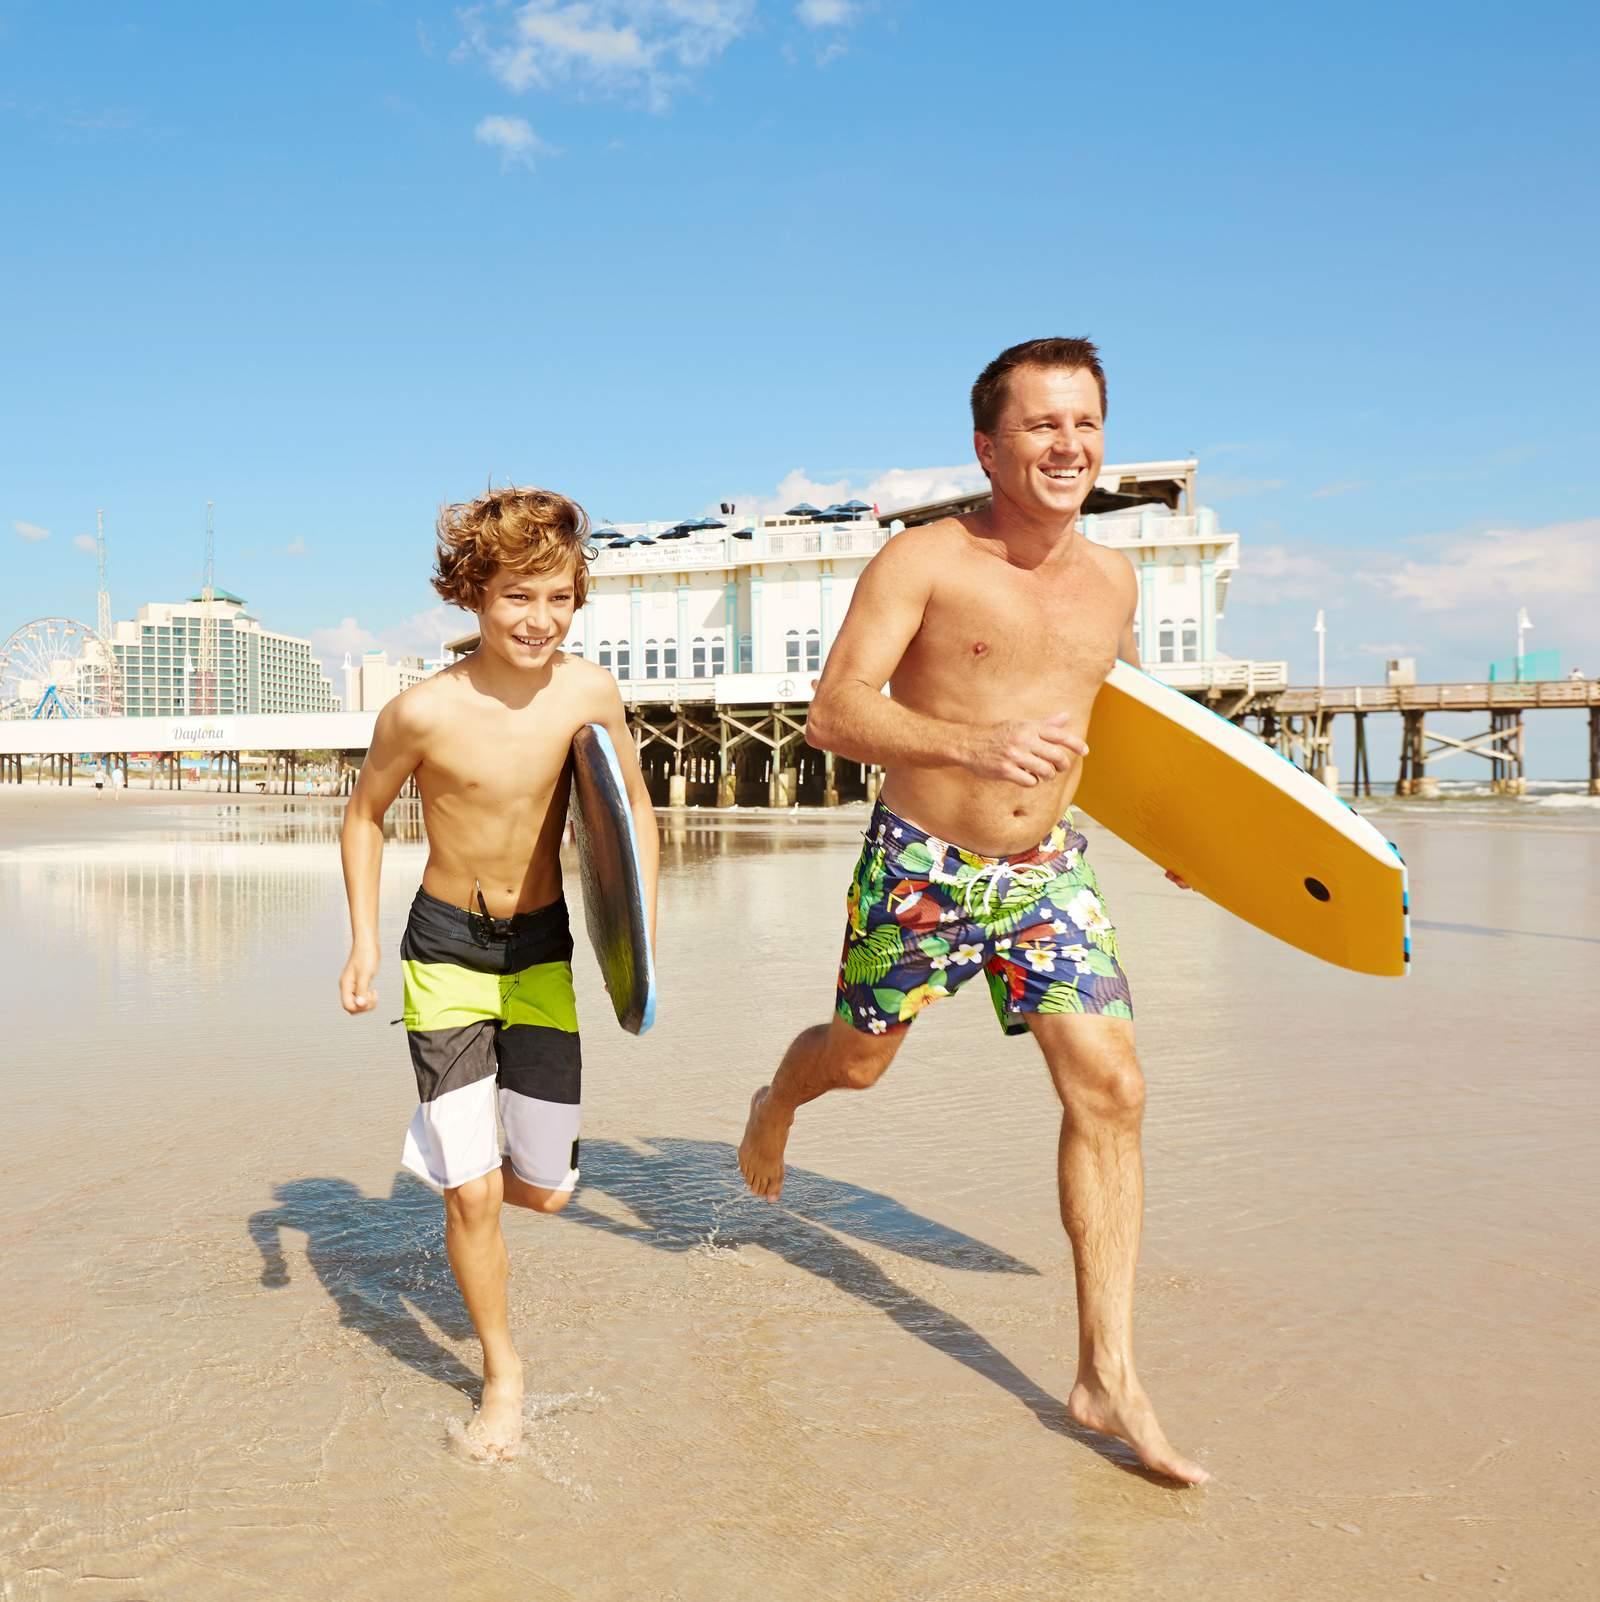 Vater und Sohn am Daytona Beach in Florida